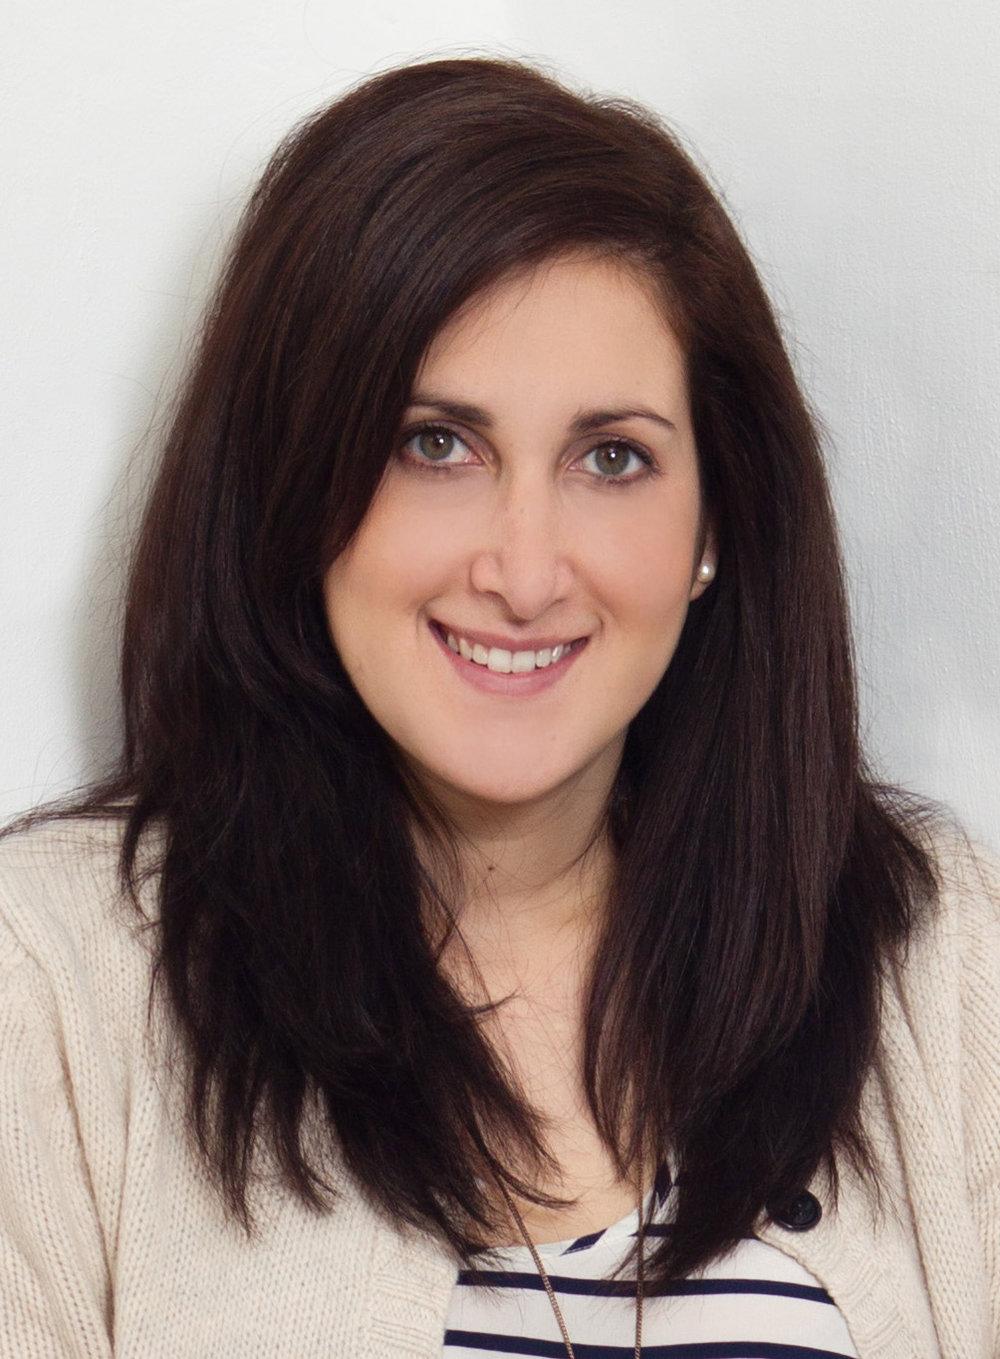 Rahaf Harfoush, Digital Anthropologist and Author